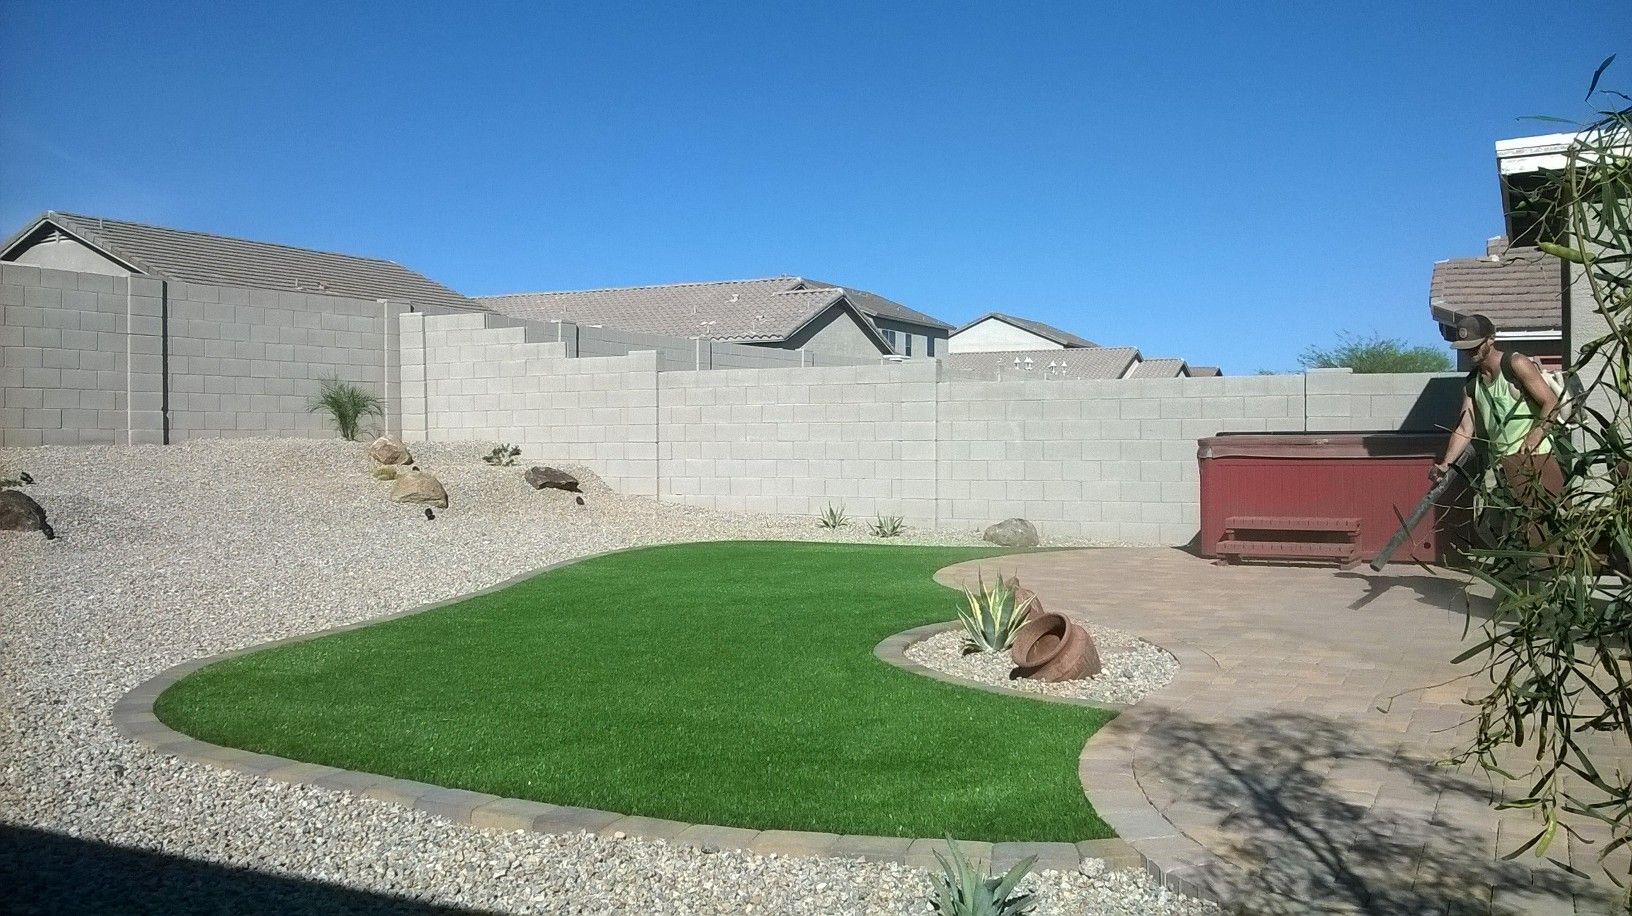 Staggering Backyard Ideas With Artificial Grass, Artificial grass